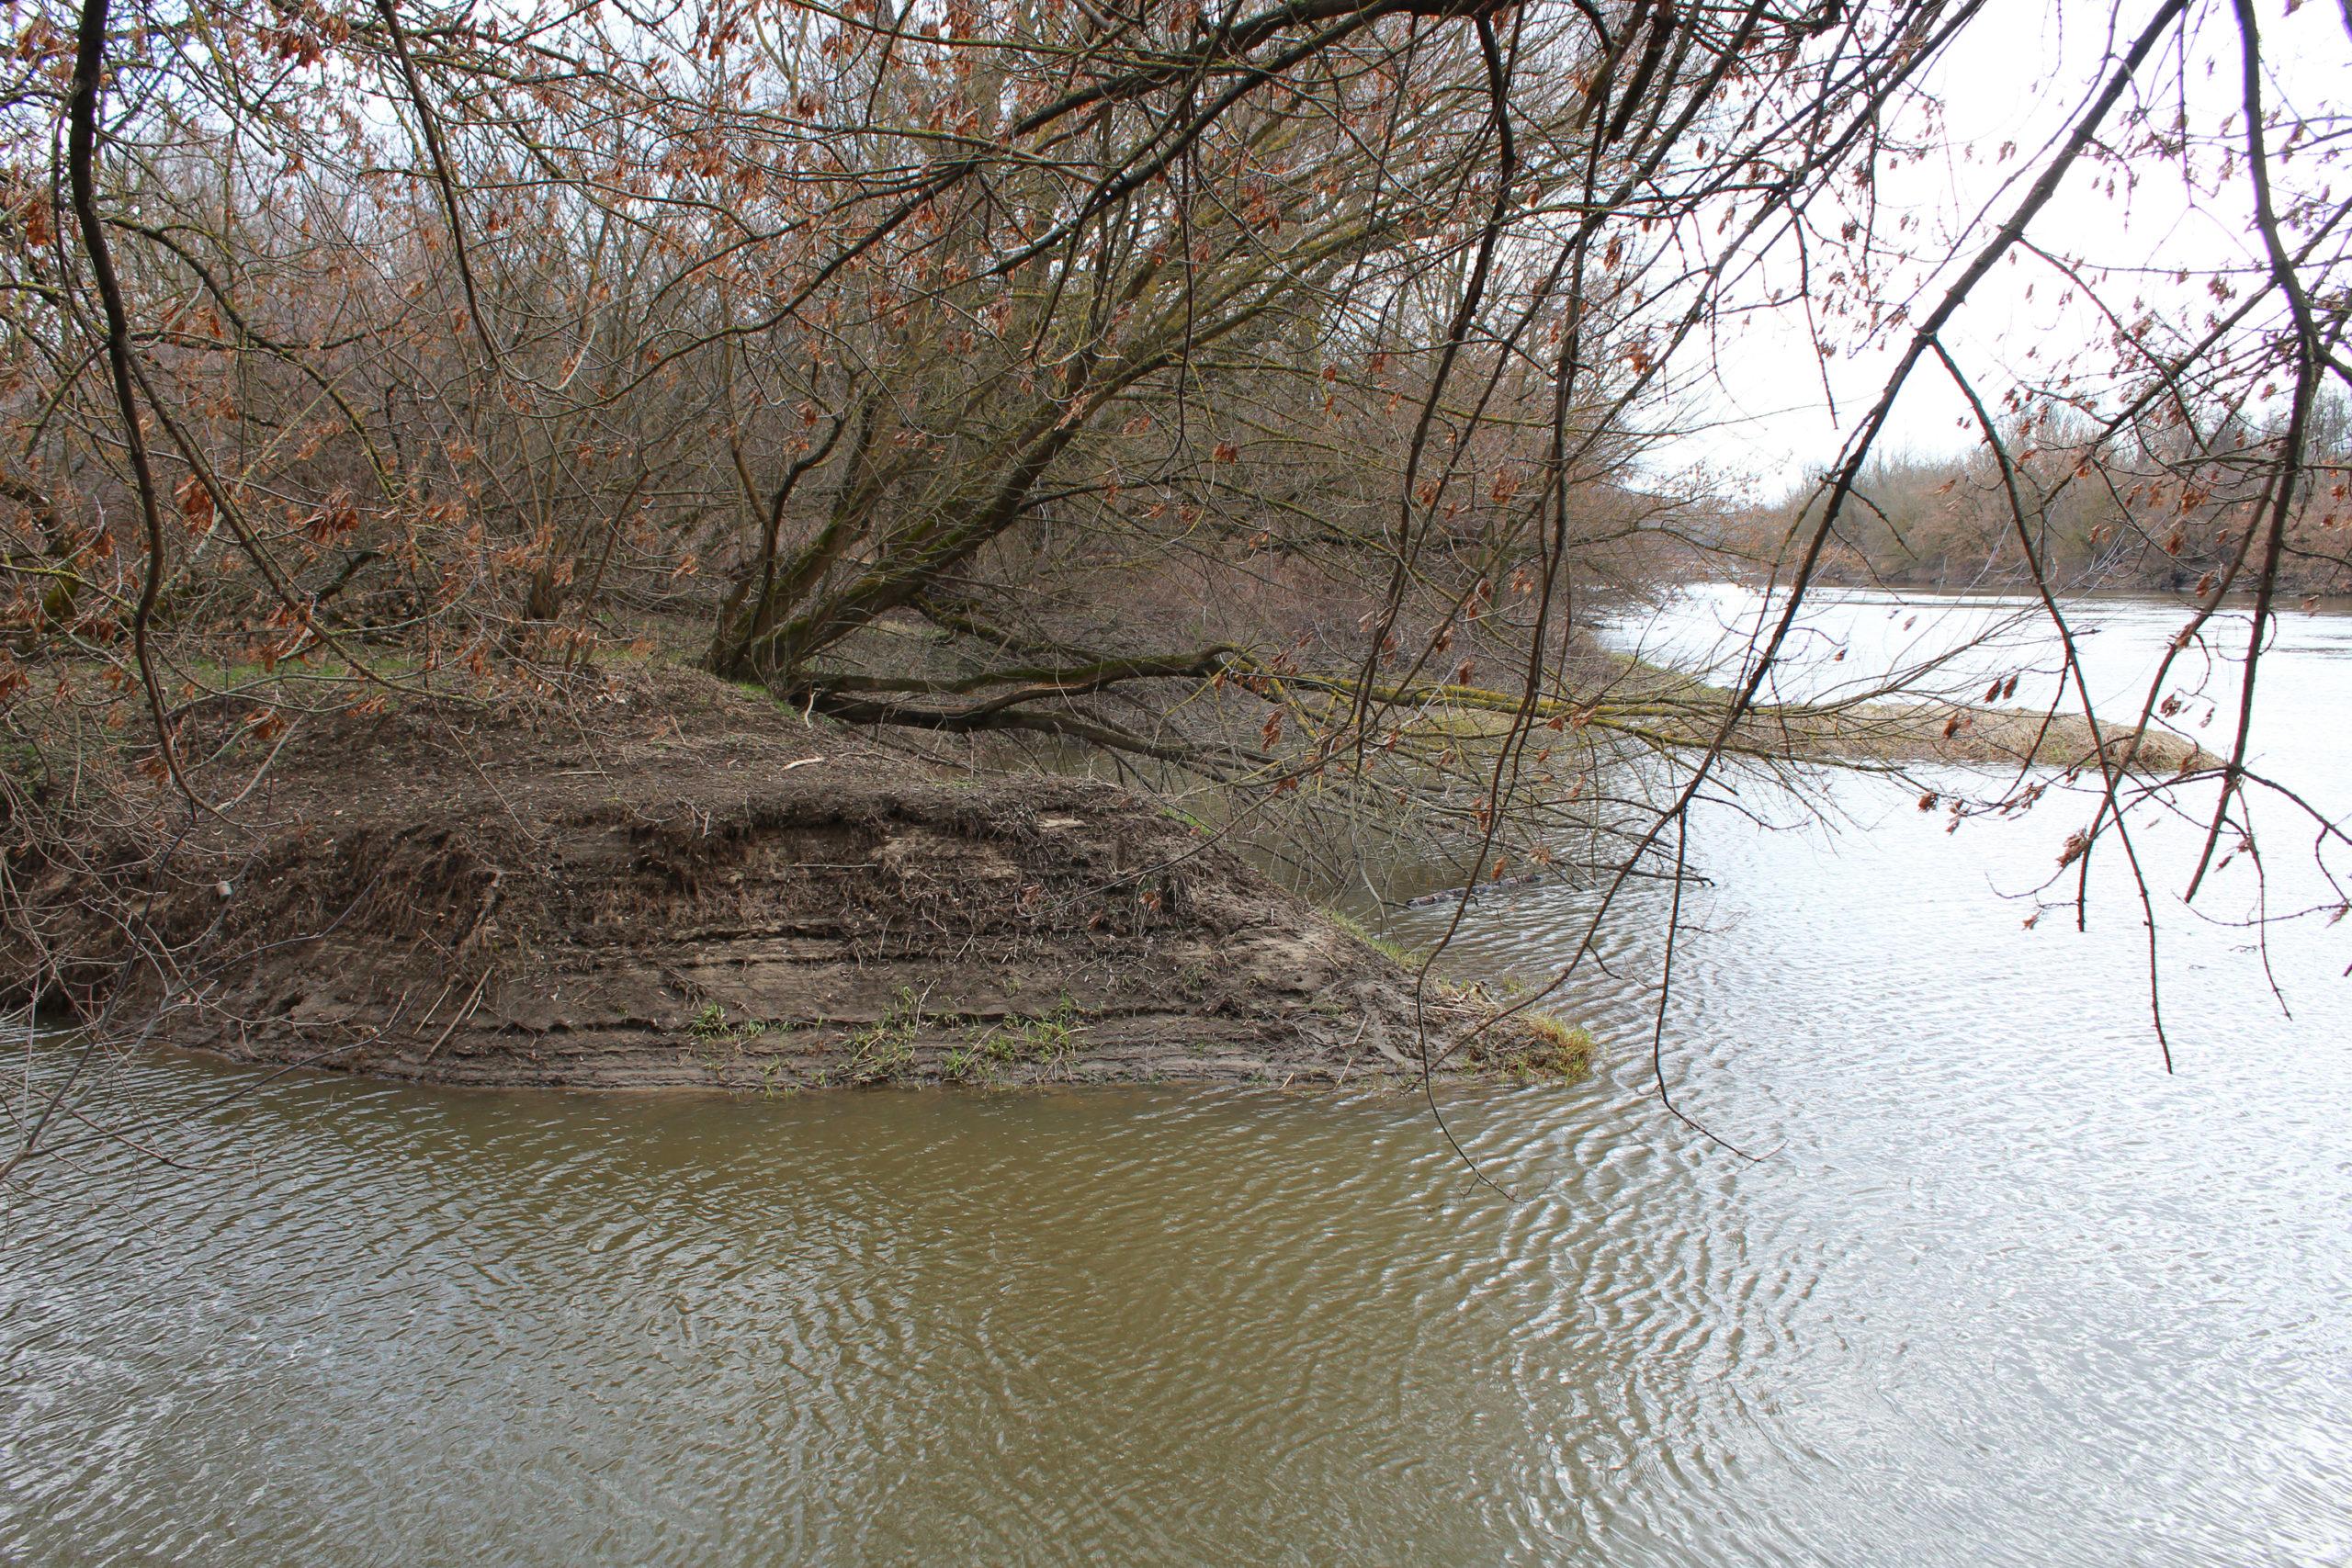 skarpa nad wodą